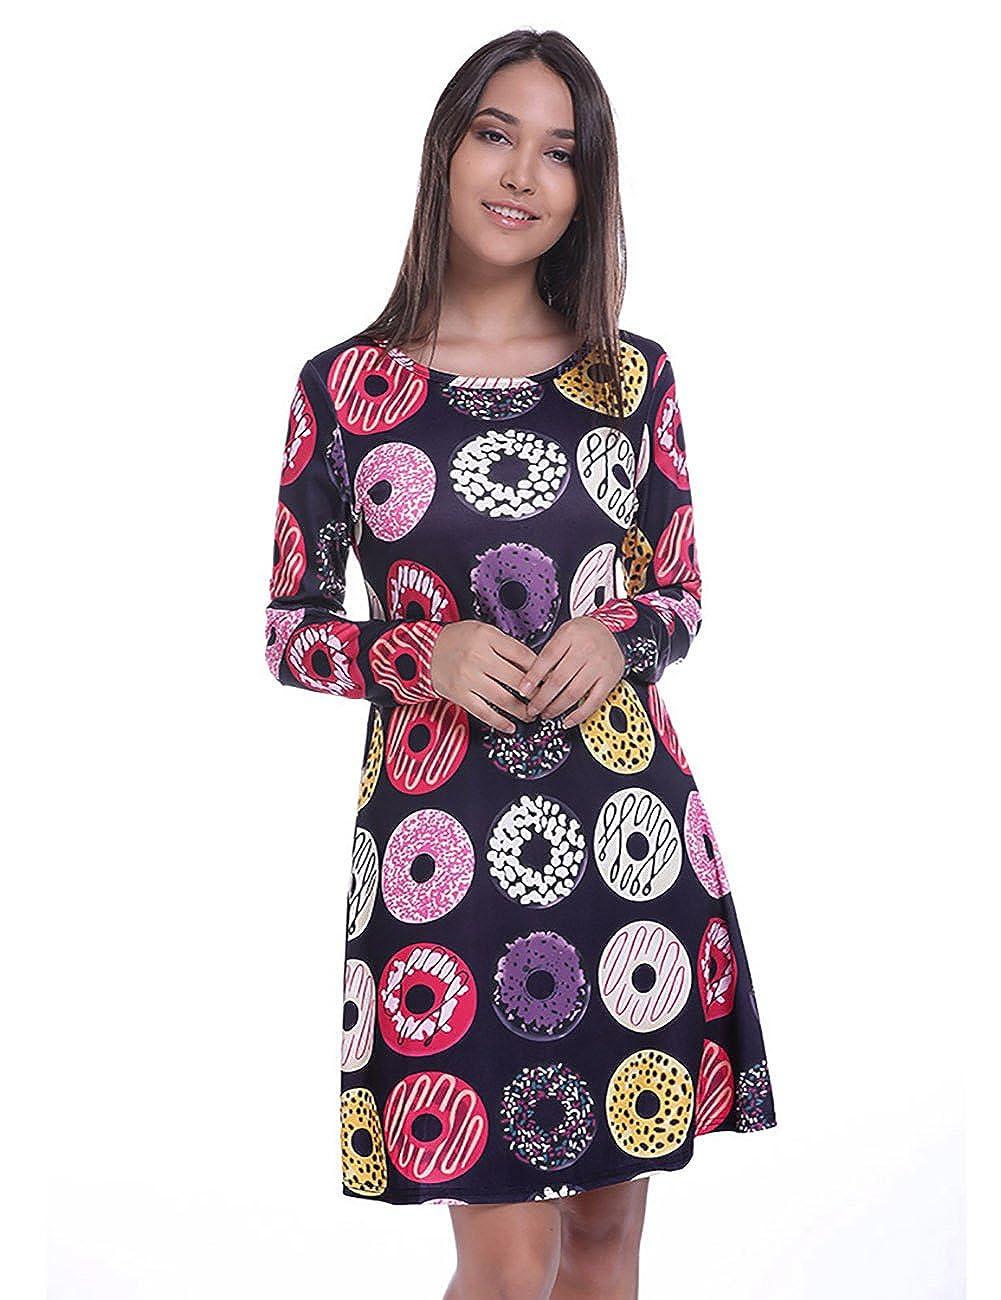 94ec3d87ca5 Black_donuts Women's Long Sleeve Dinosaur Plaid Print TShirt Dress Pockets  Casual Fancyqube nzsfur1508-Dresses